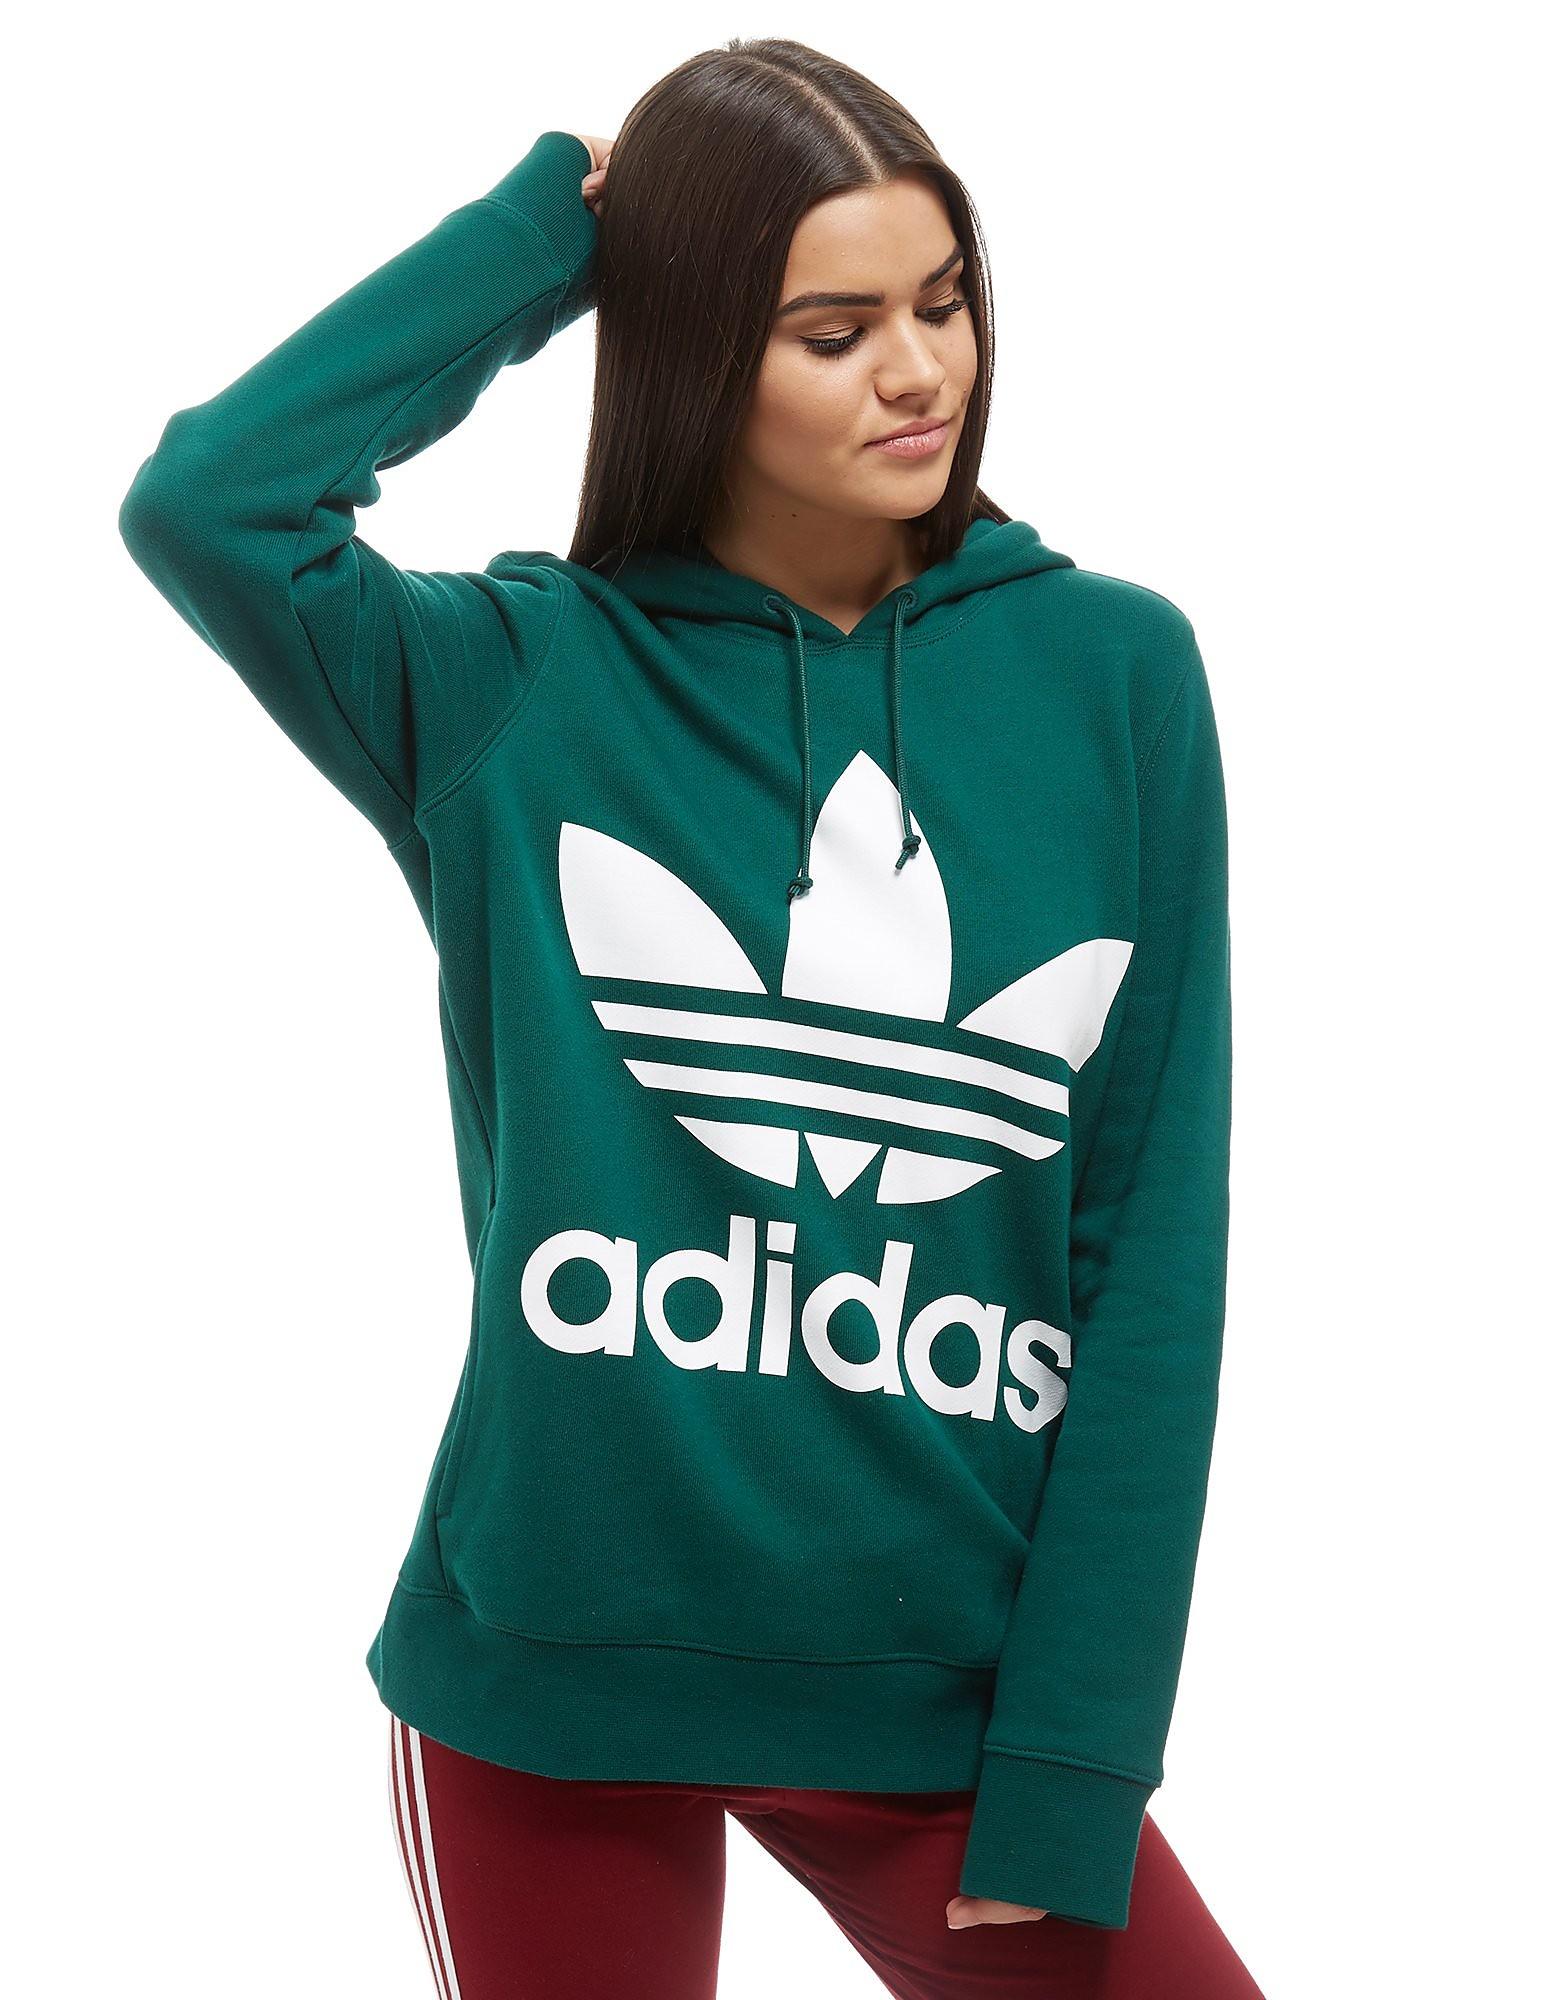 adidas Originals Sweat à capuche Trefoil Femme - vert/blanc, vert/blanc